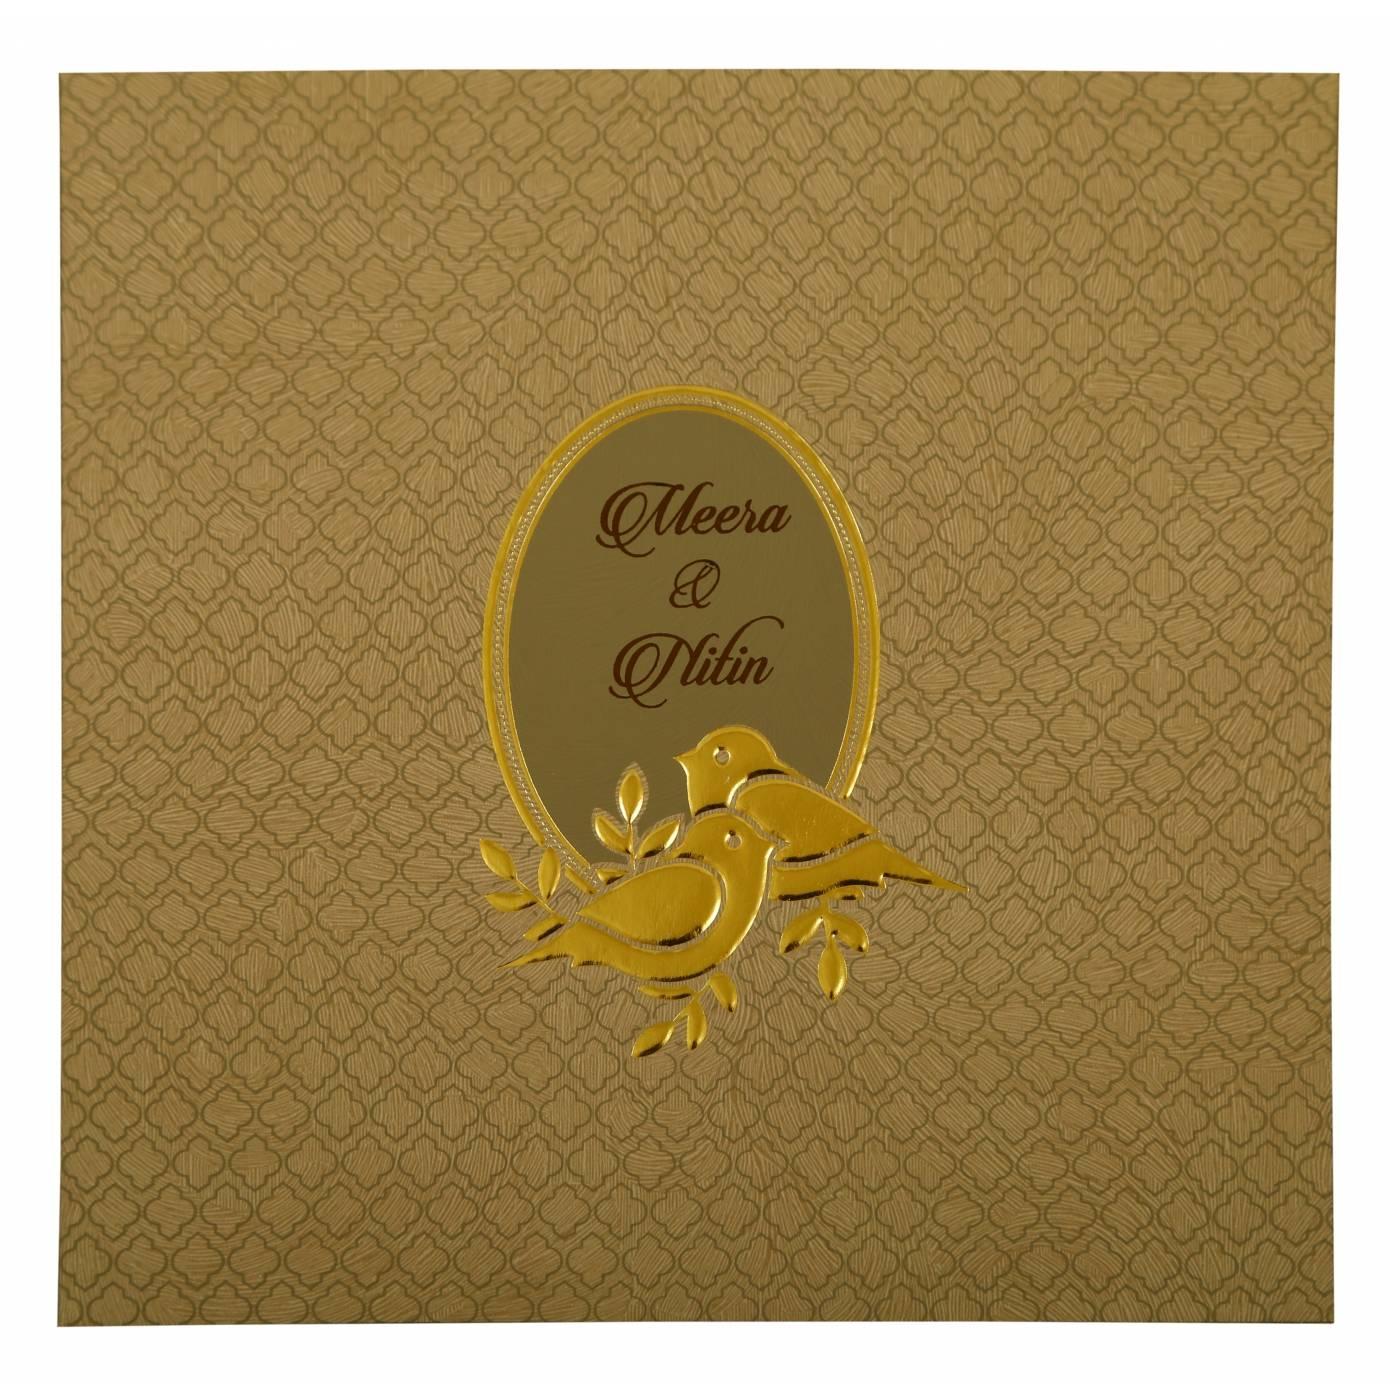 GREY MATTE FOIL STAMPED WEDDING INVITATION : CD-1885 - IndianWeddingCards